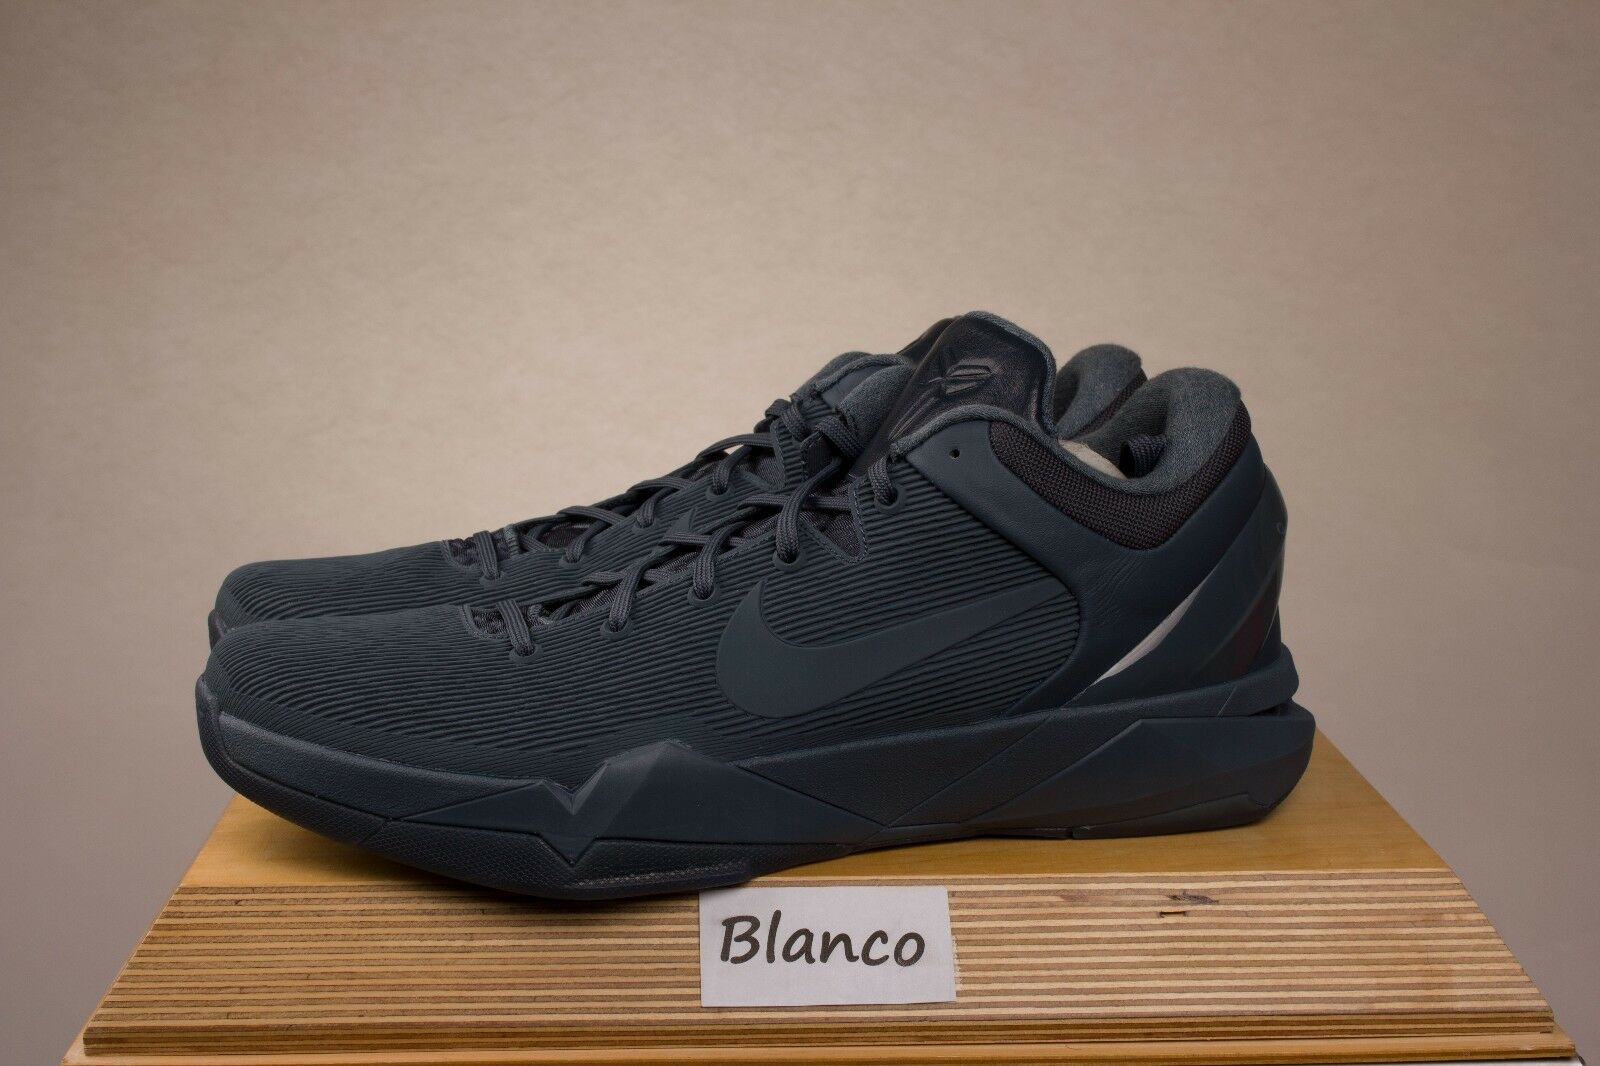 bc71048aababd4 Nike US Zoom Kobe VII FTB US Nike 13 13.5 869460-442 Fade To Black 7 ...